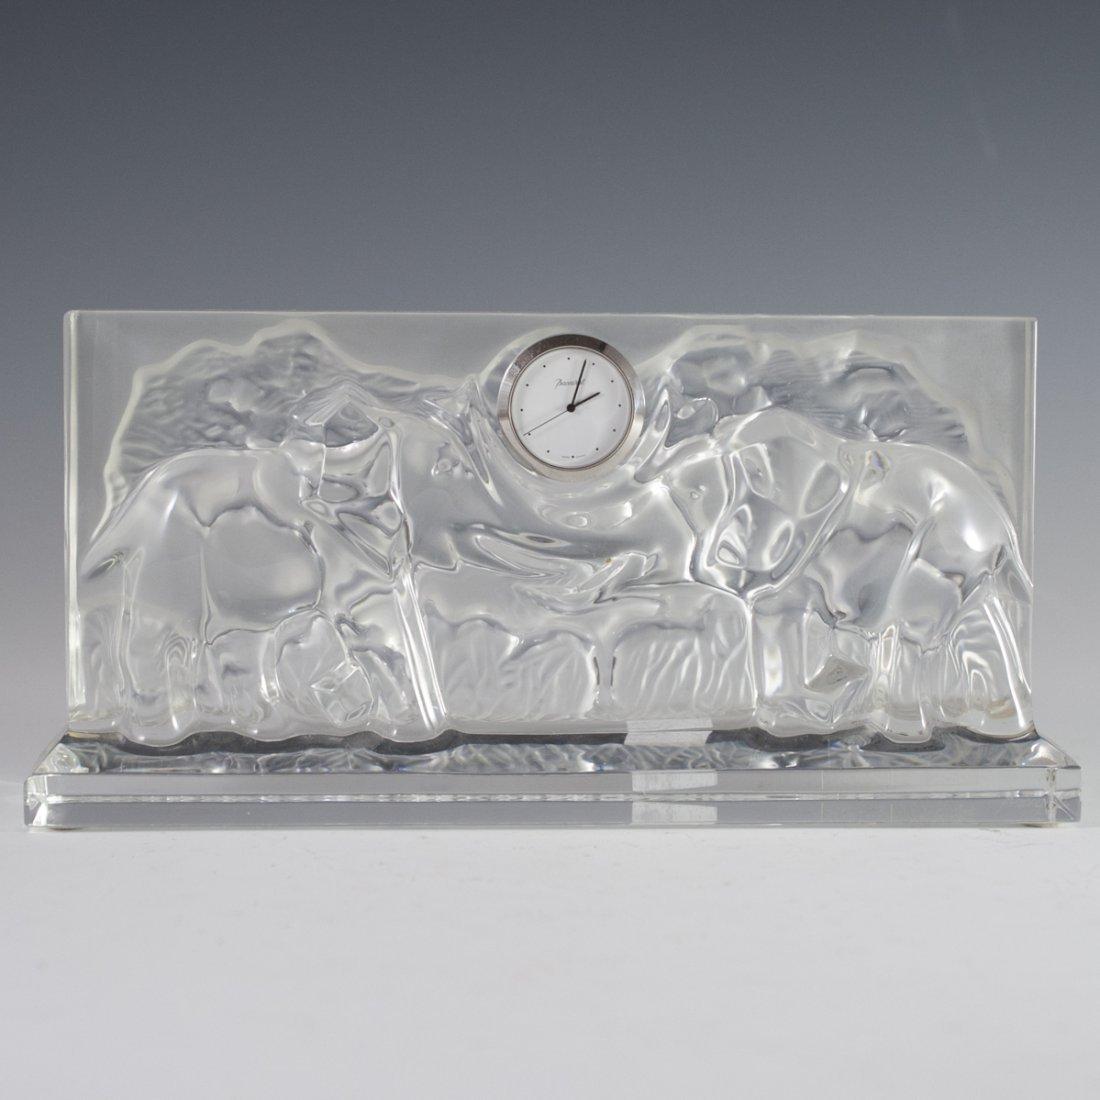 Baccarat Crystal Elephant Mantel Clock